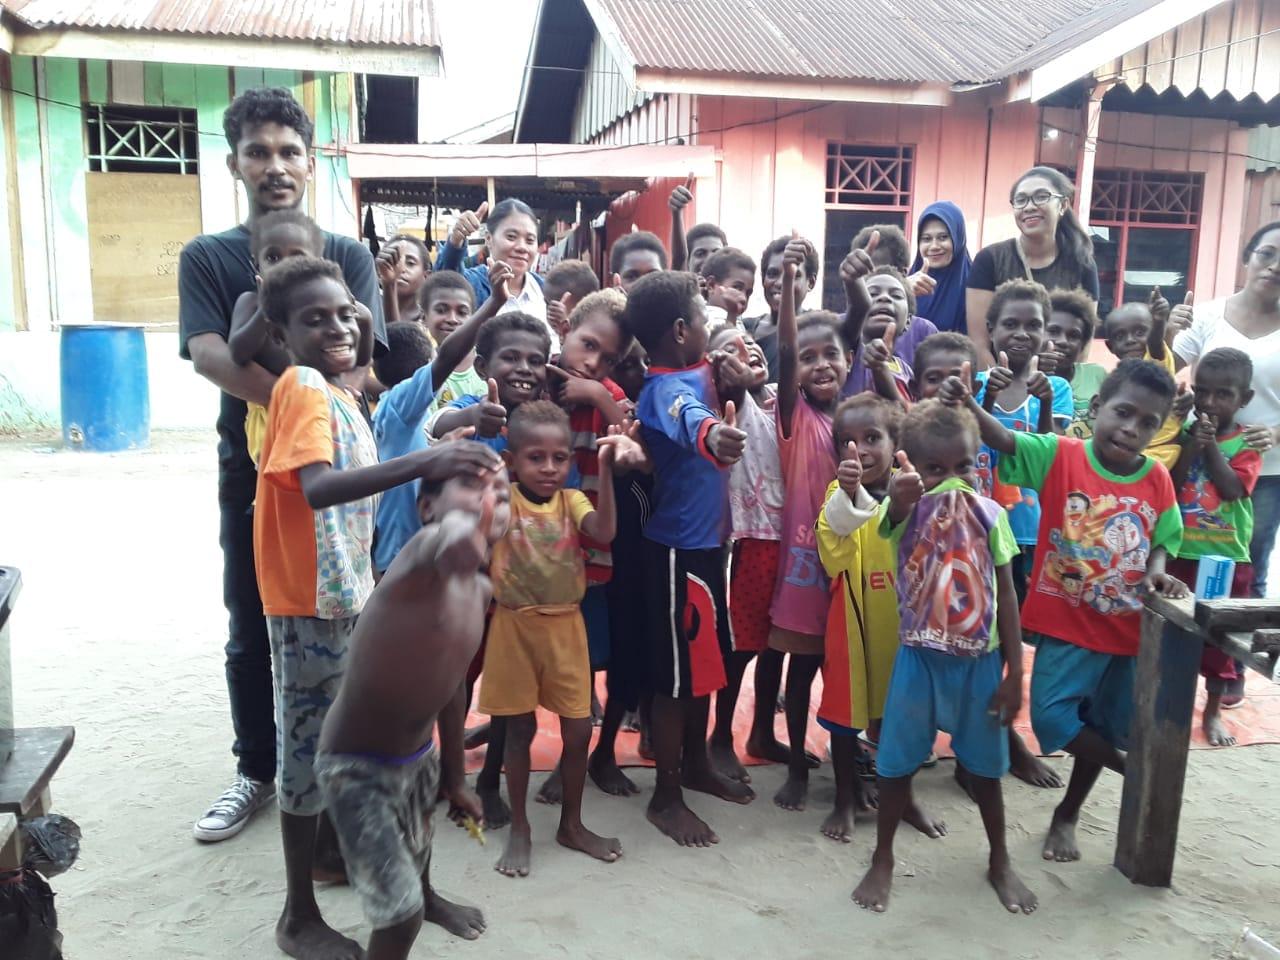 Anak - Anak Binaan Relawan Peduli Anak Bangsa